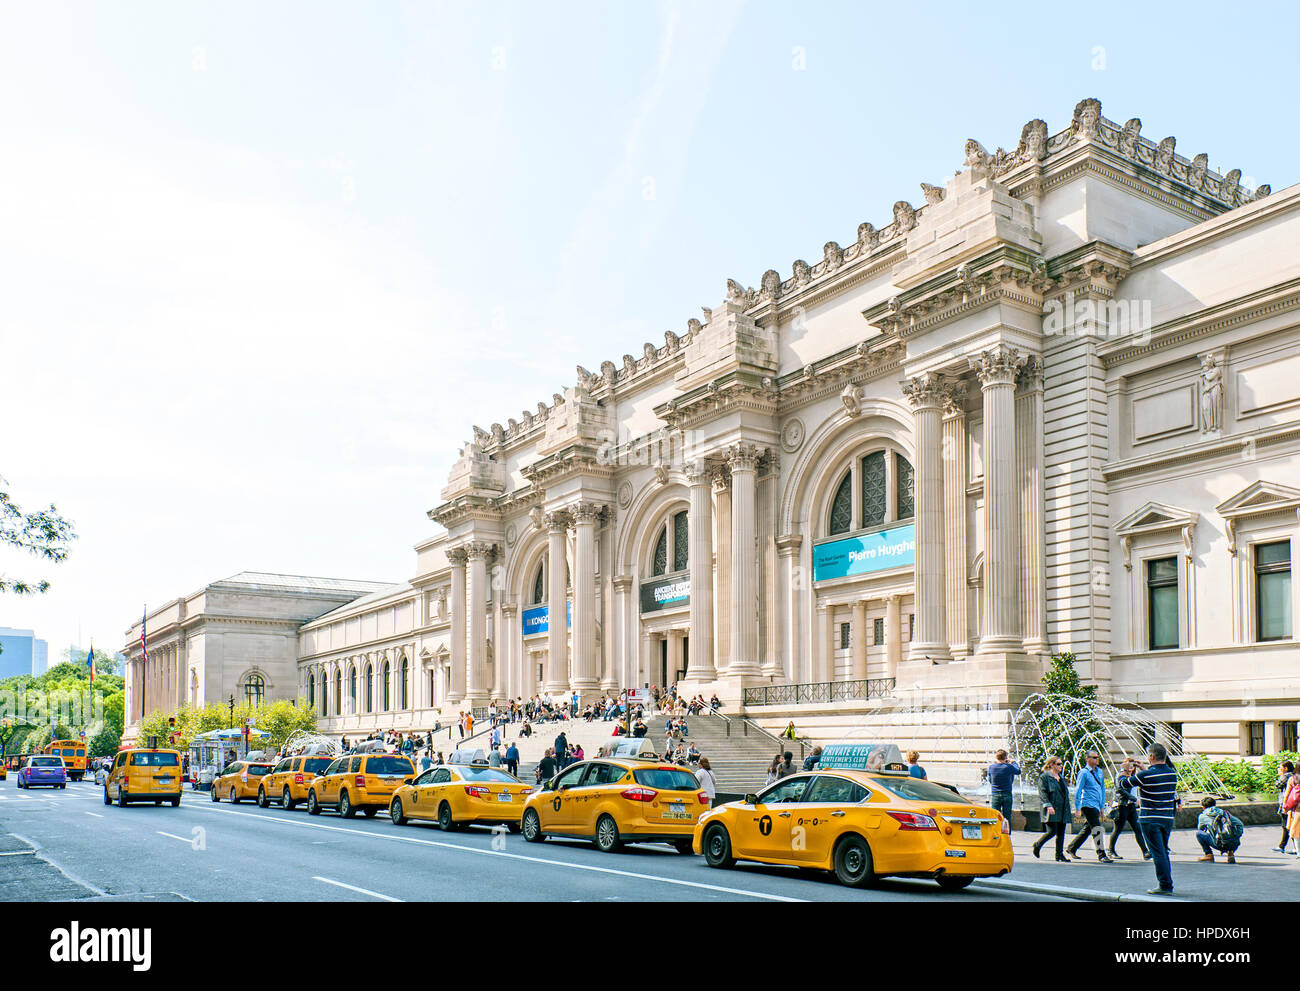 The Metropolitan Museum of Art, the Met Museum Exterior, Fifth Avenue, New York City - Stock Image